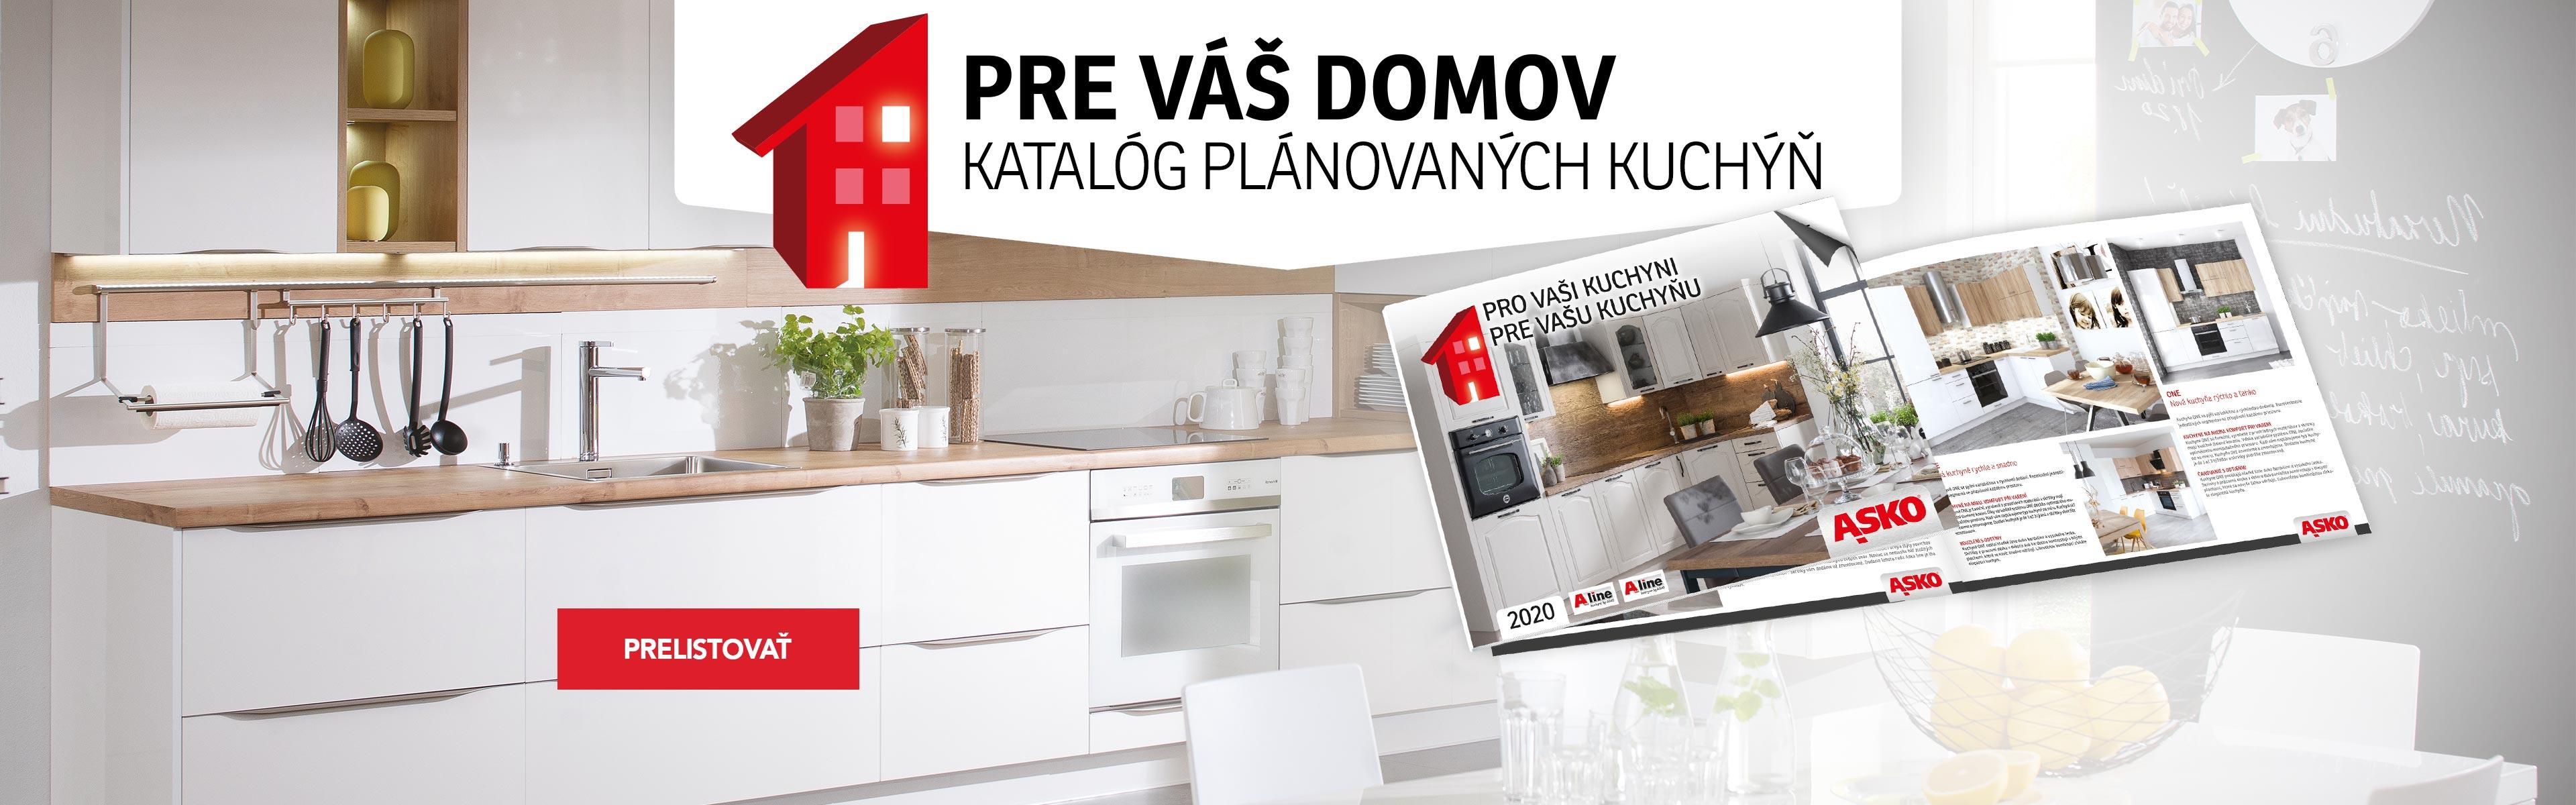 Kuchyně-katalog-Decodom